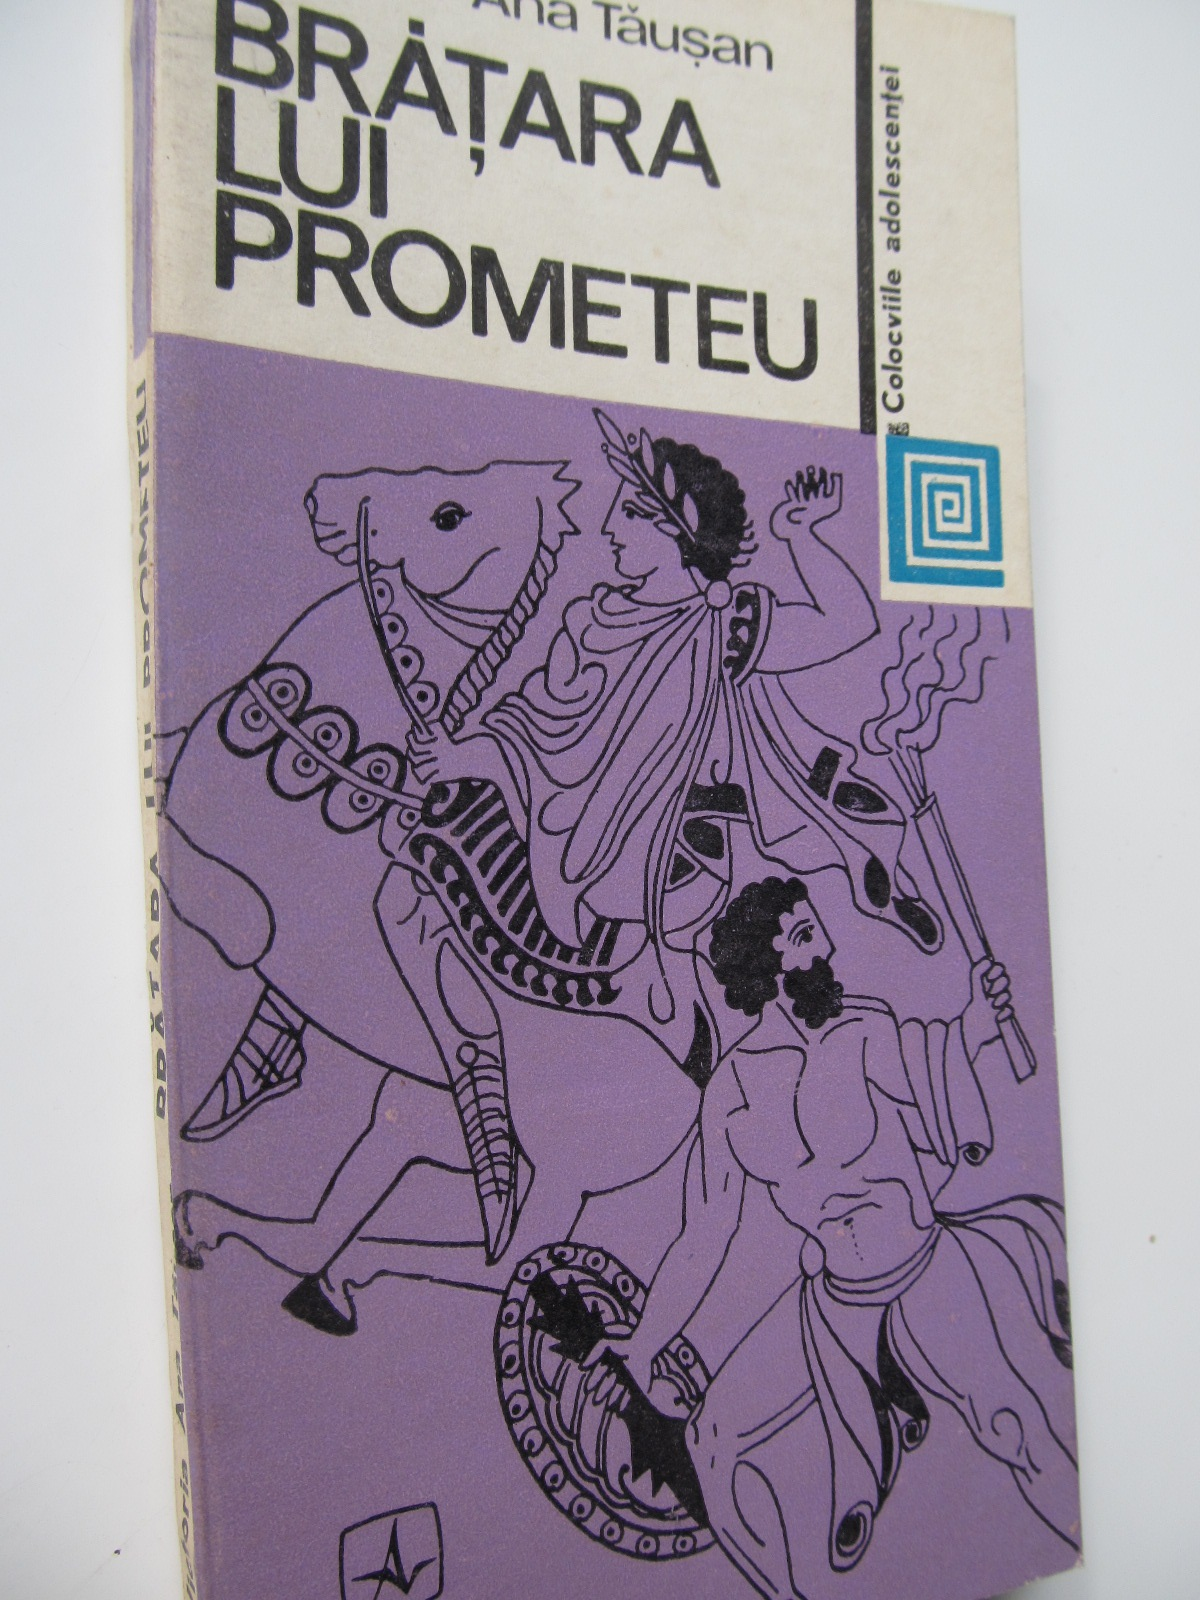 Bratara lui Prometeu - Victoria Ana Tausan | Detalii carte